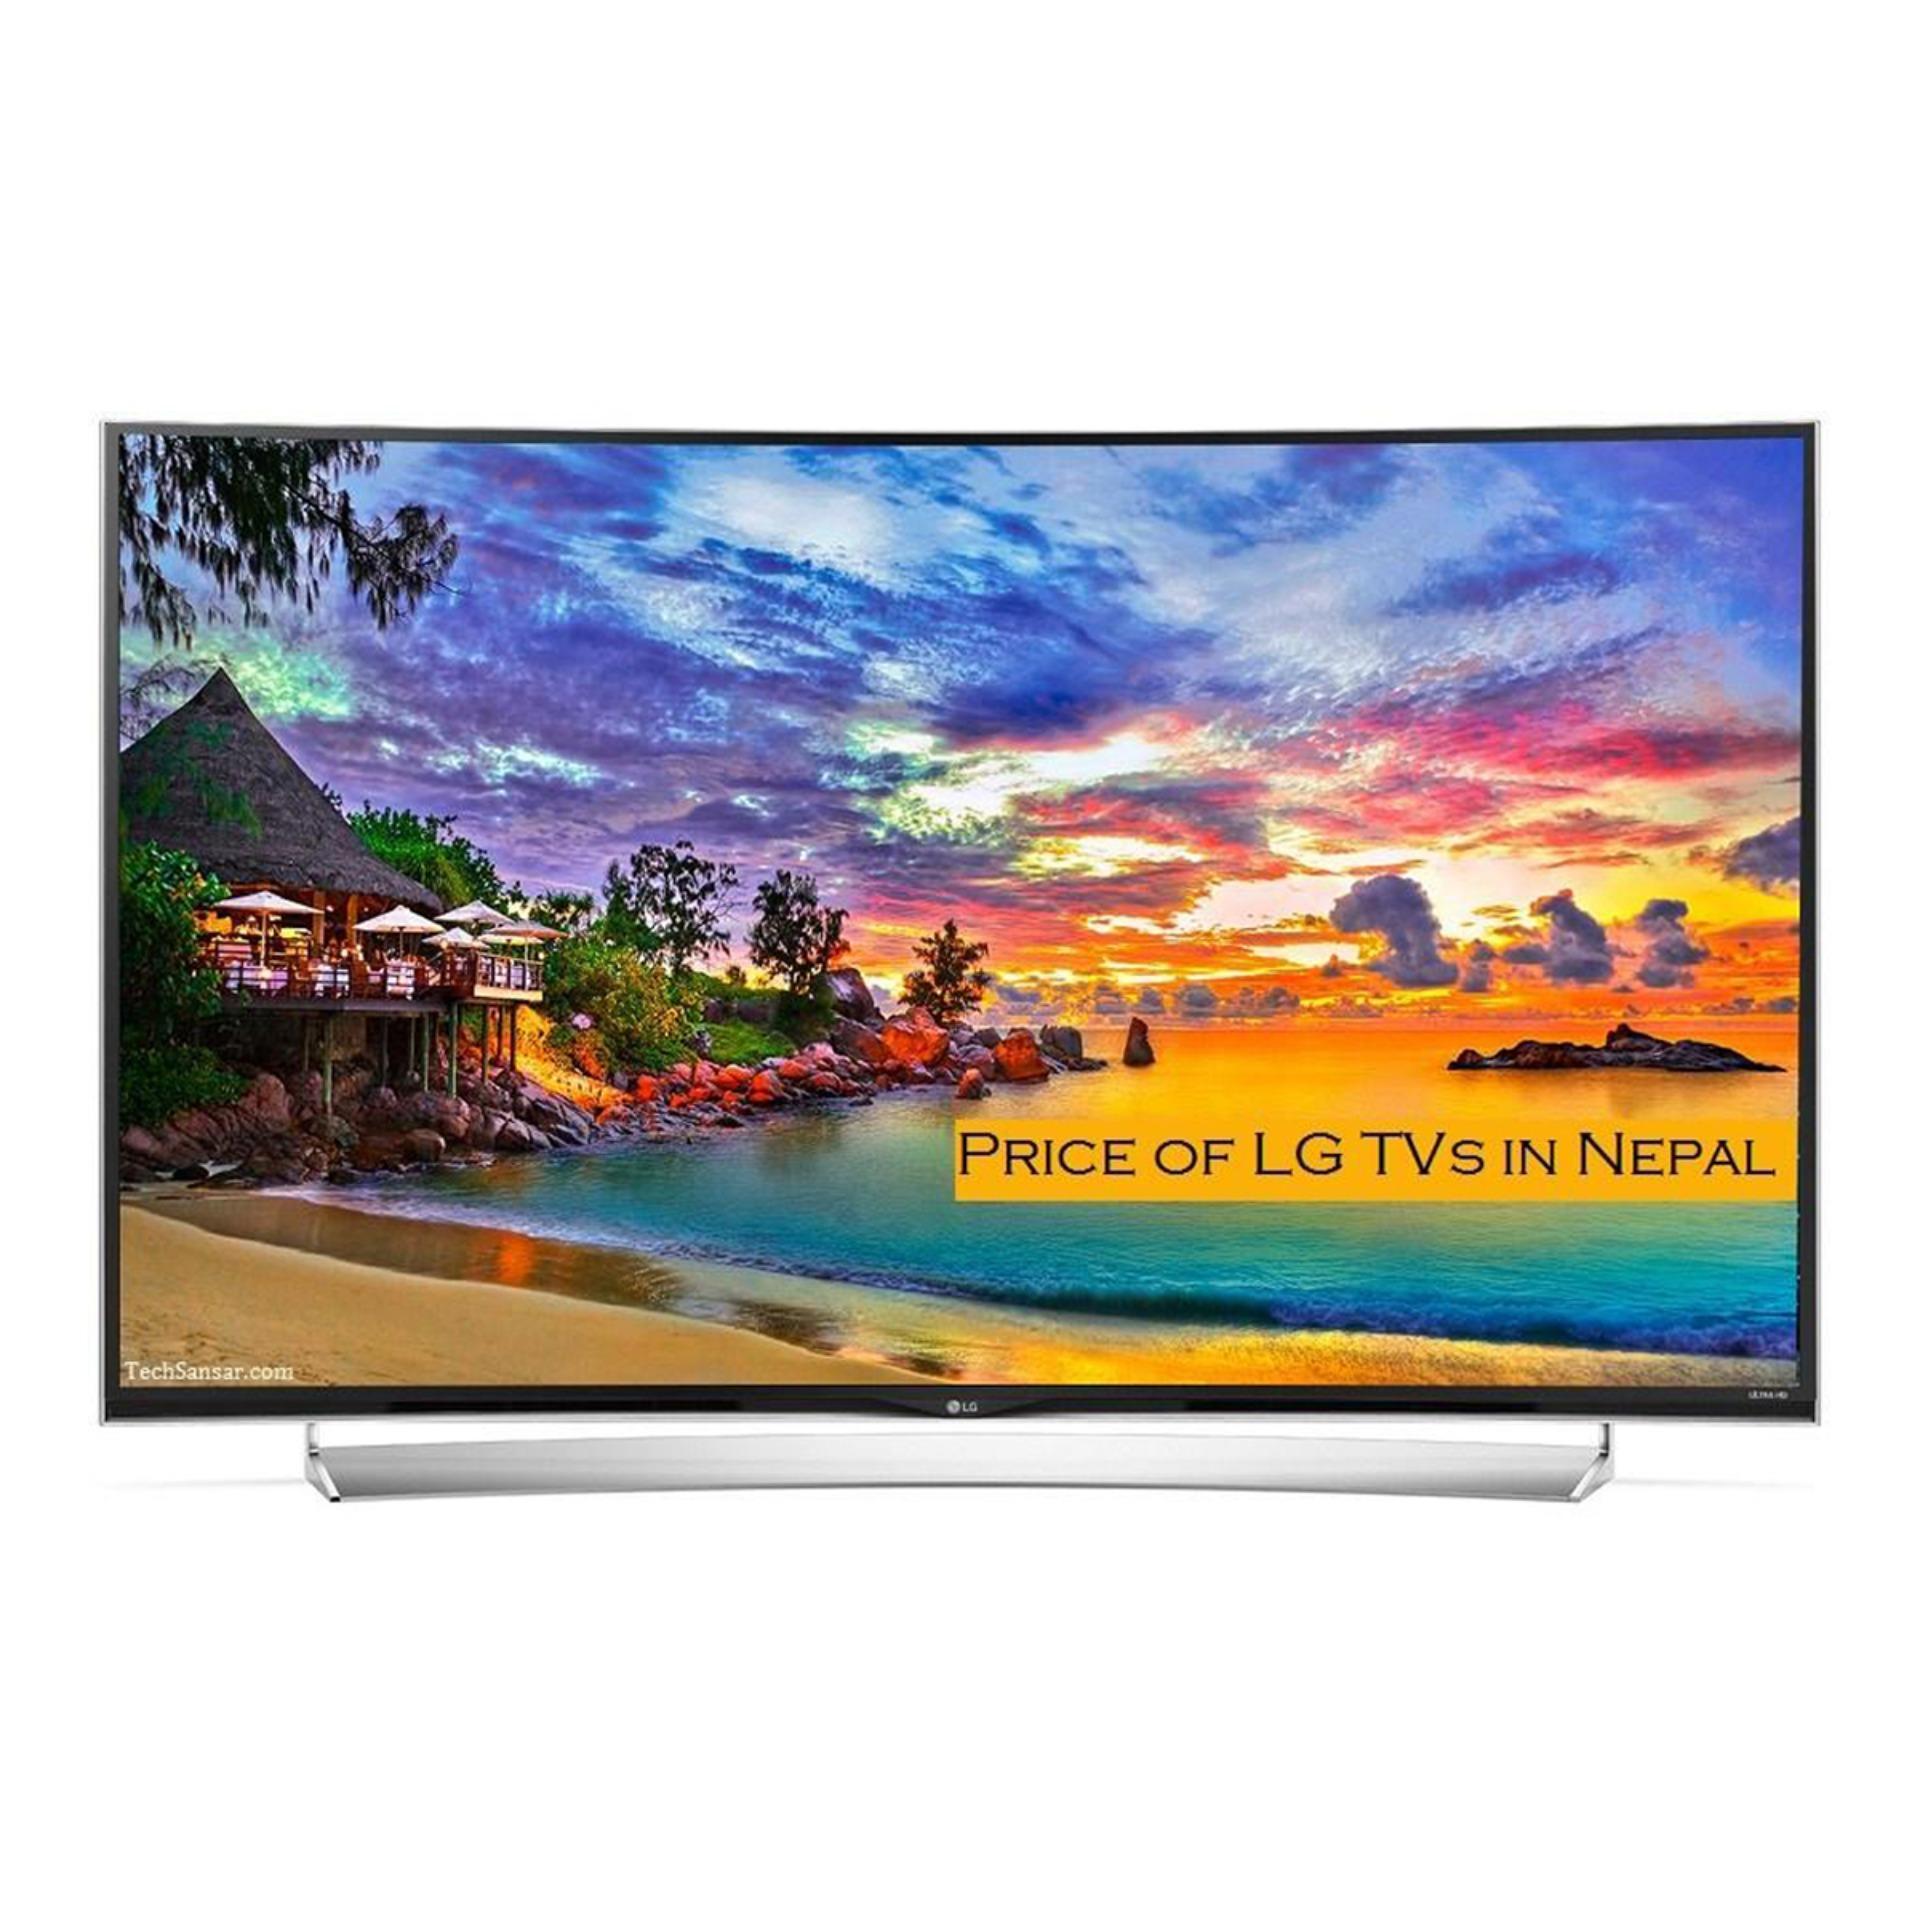 Best Non Smart Tv 2019 Televisions Online: Best TV Price In Bangladesh 2019   Daraz.com.bd